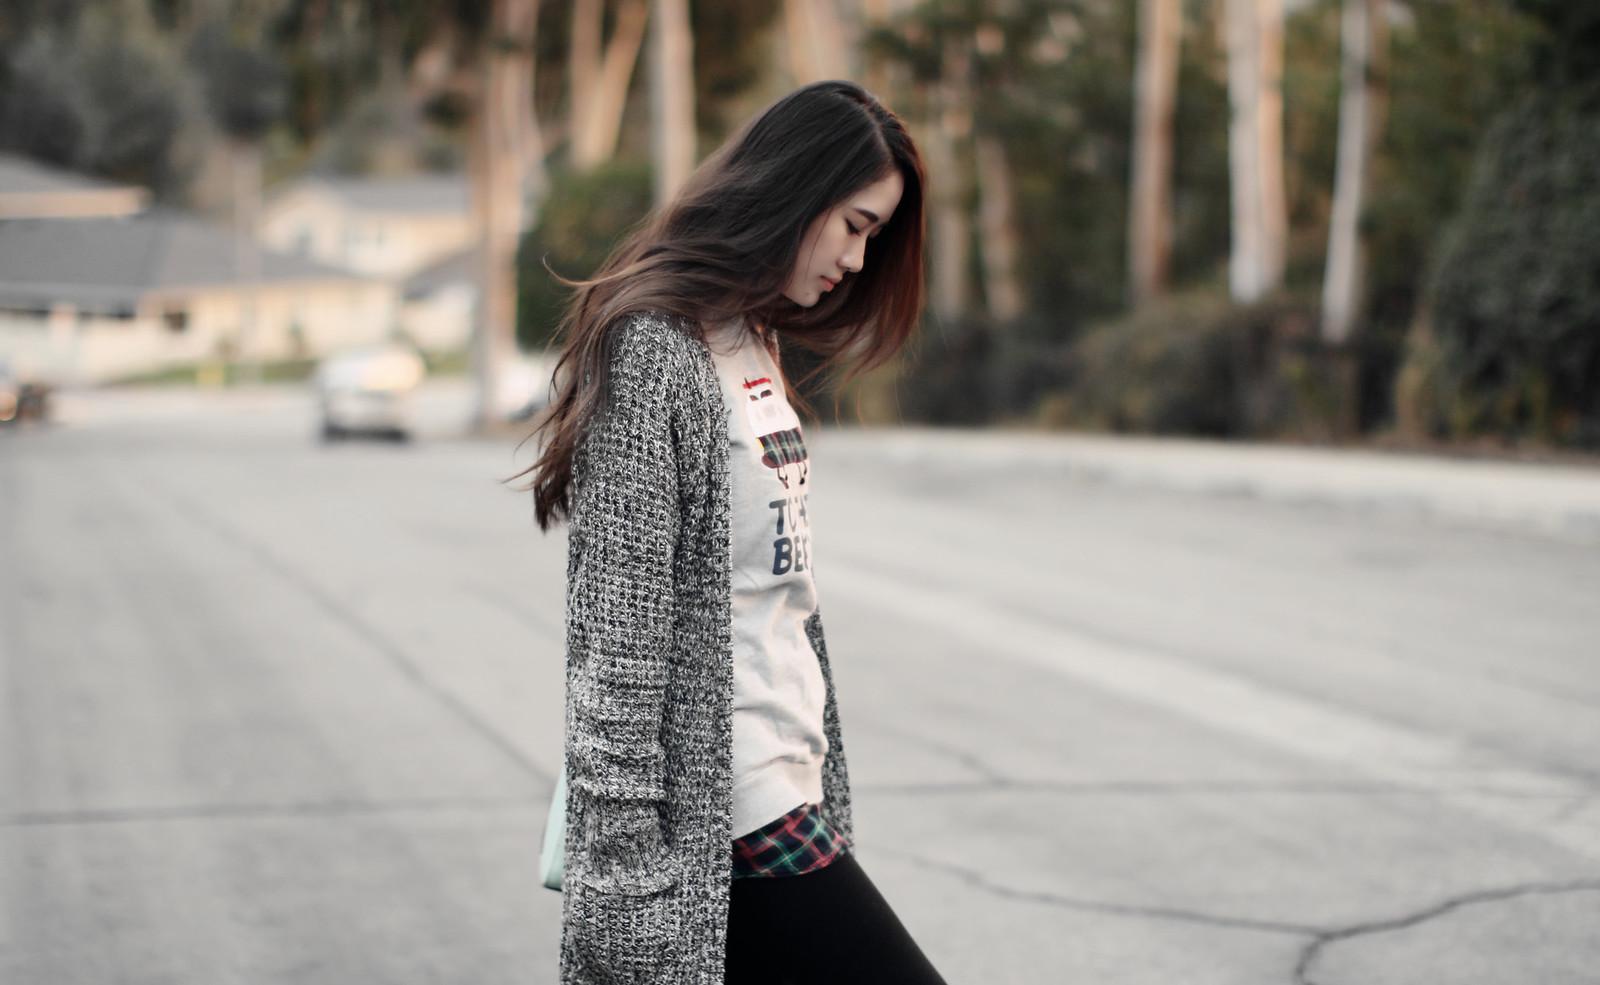 1300-ootd-sweaterdress-koreanfashion-asianfashion-korean-fall-yesstyle-sweaterweather-clothestoyouuu-blogger-elizabeeetht